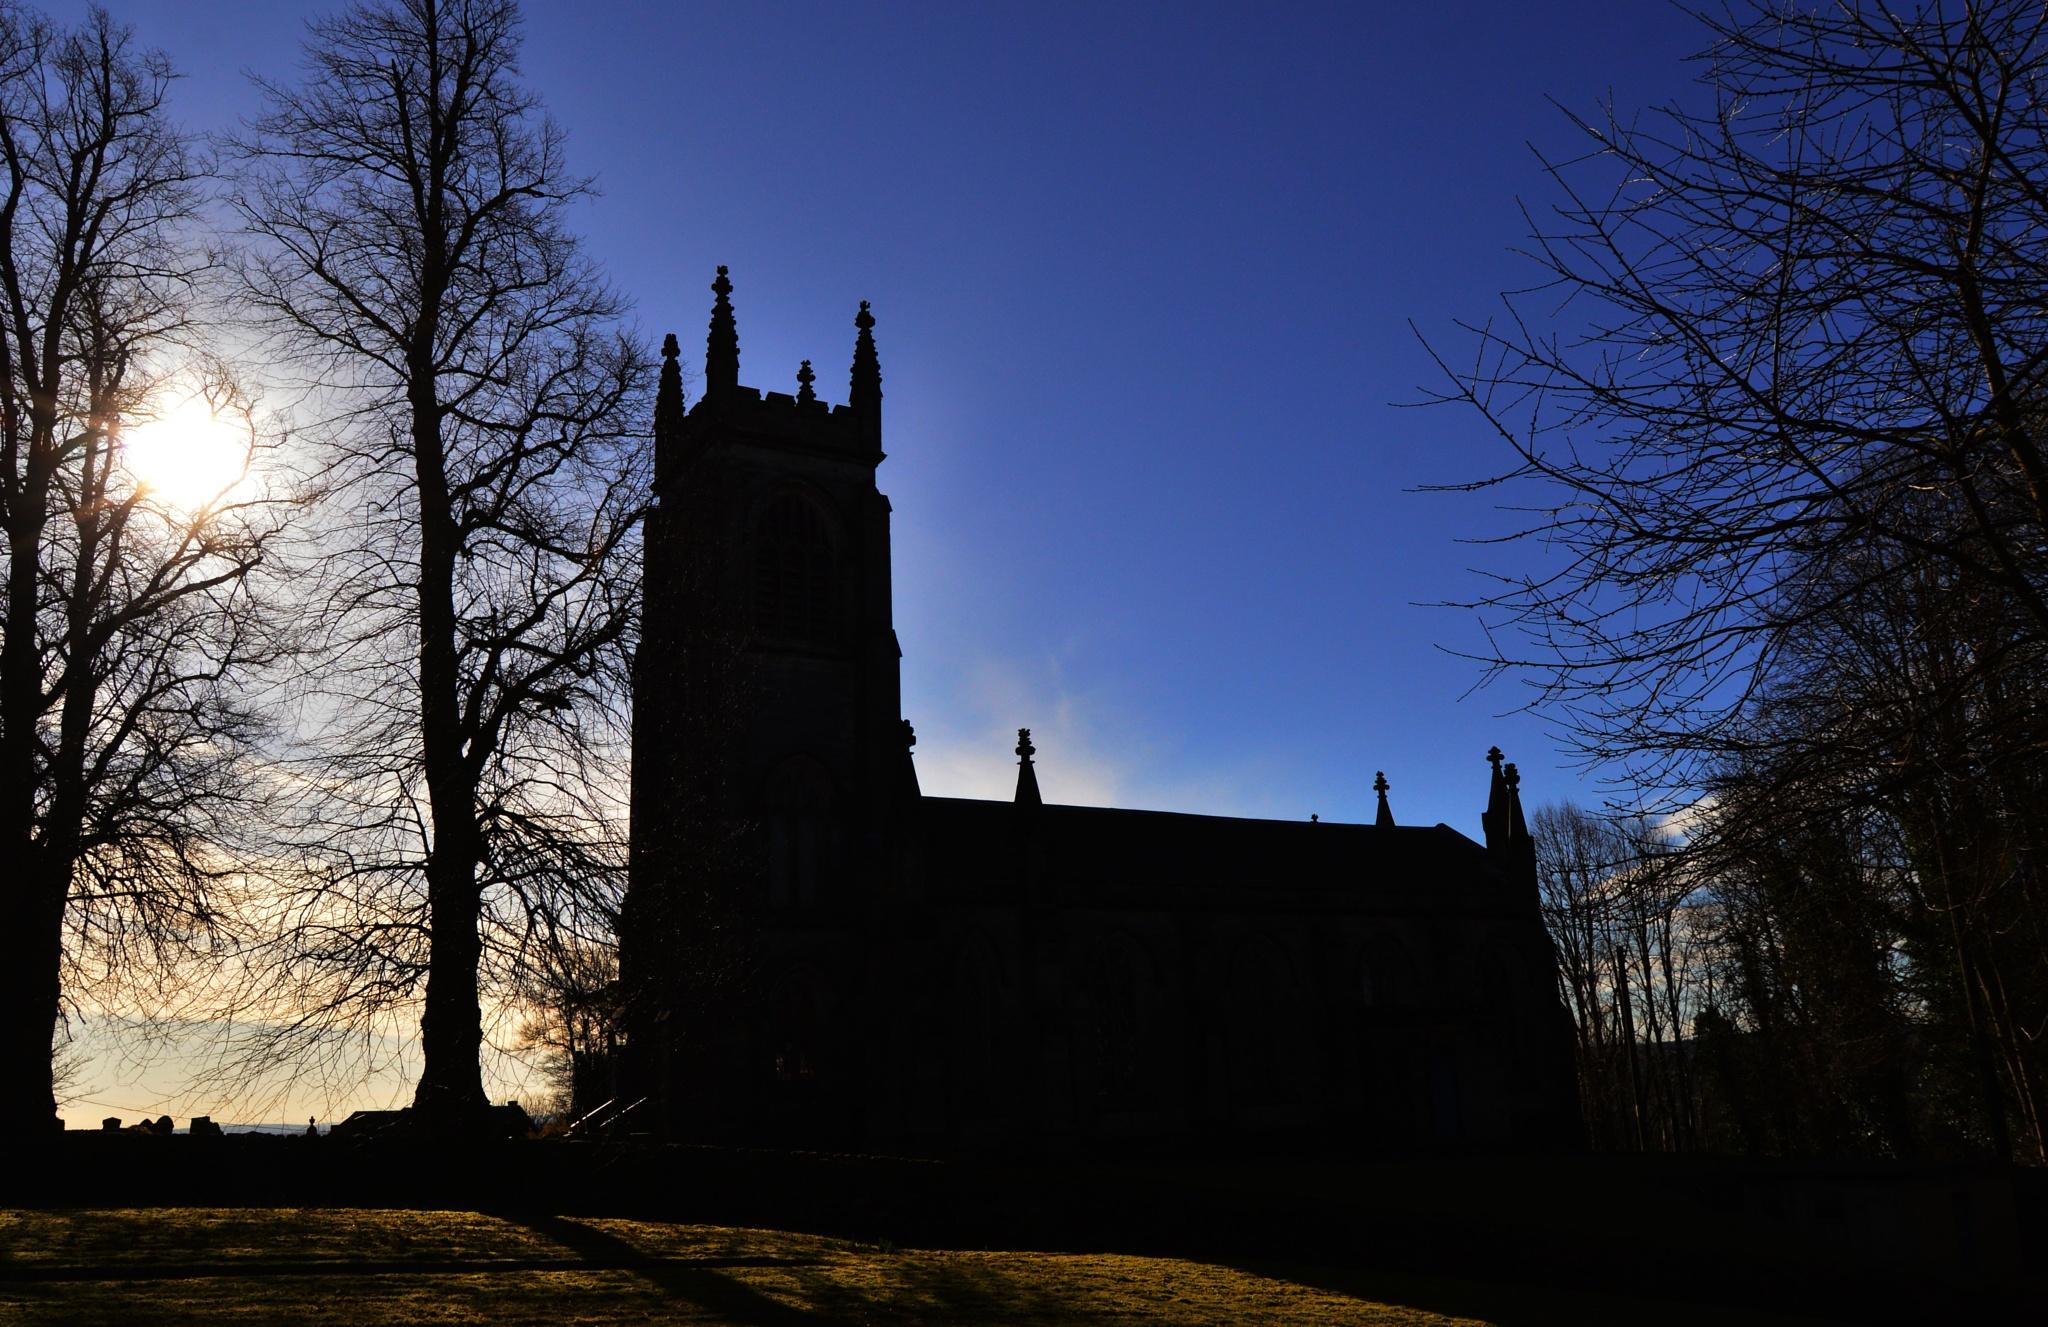 Church in silhouette by John White